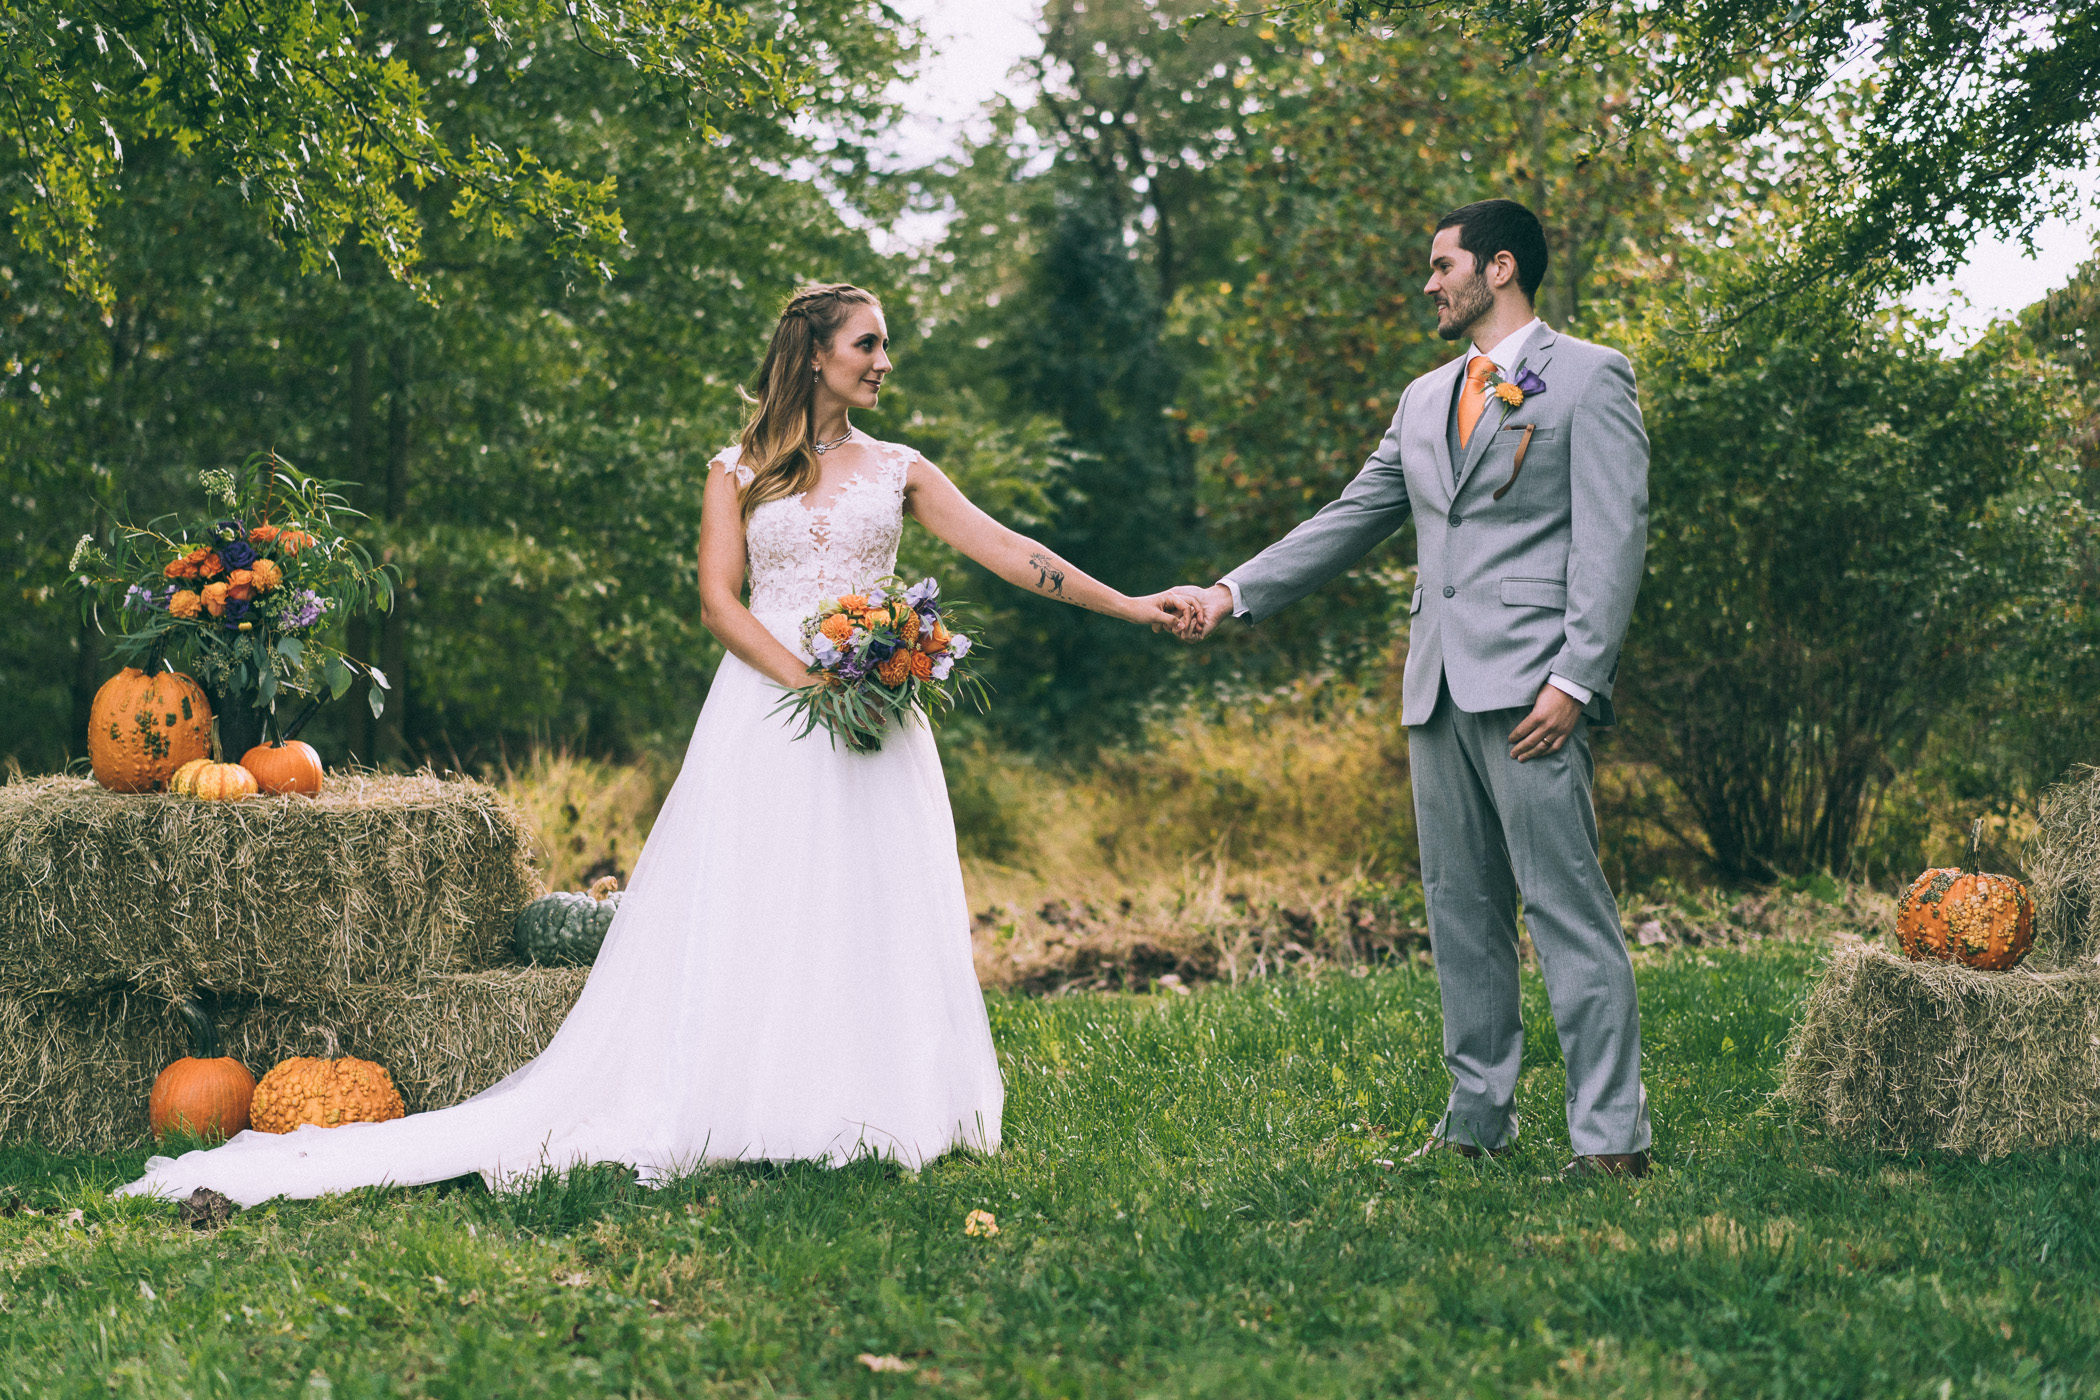 18-Faux Wedding-brandon shane warren-267.jpg